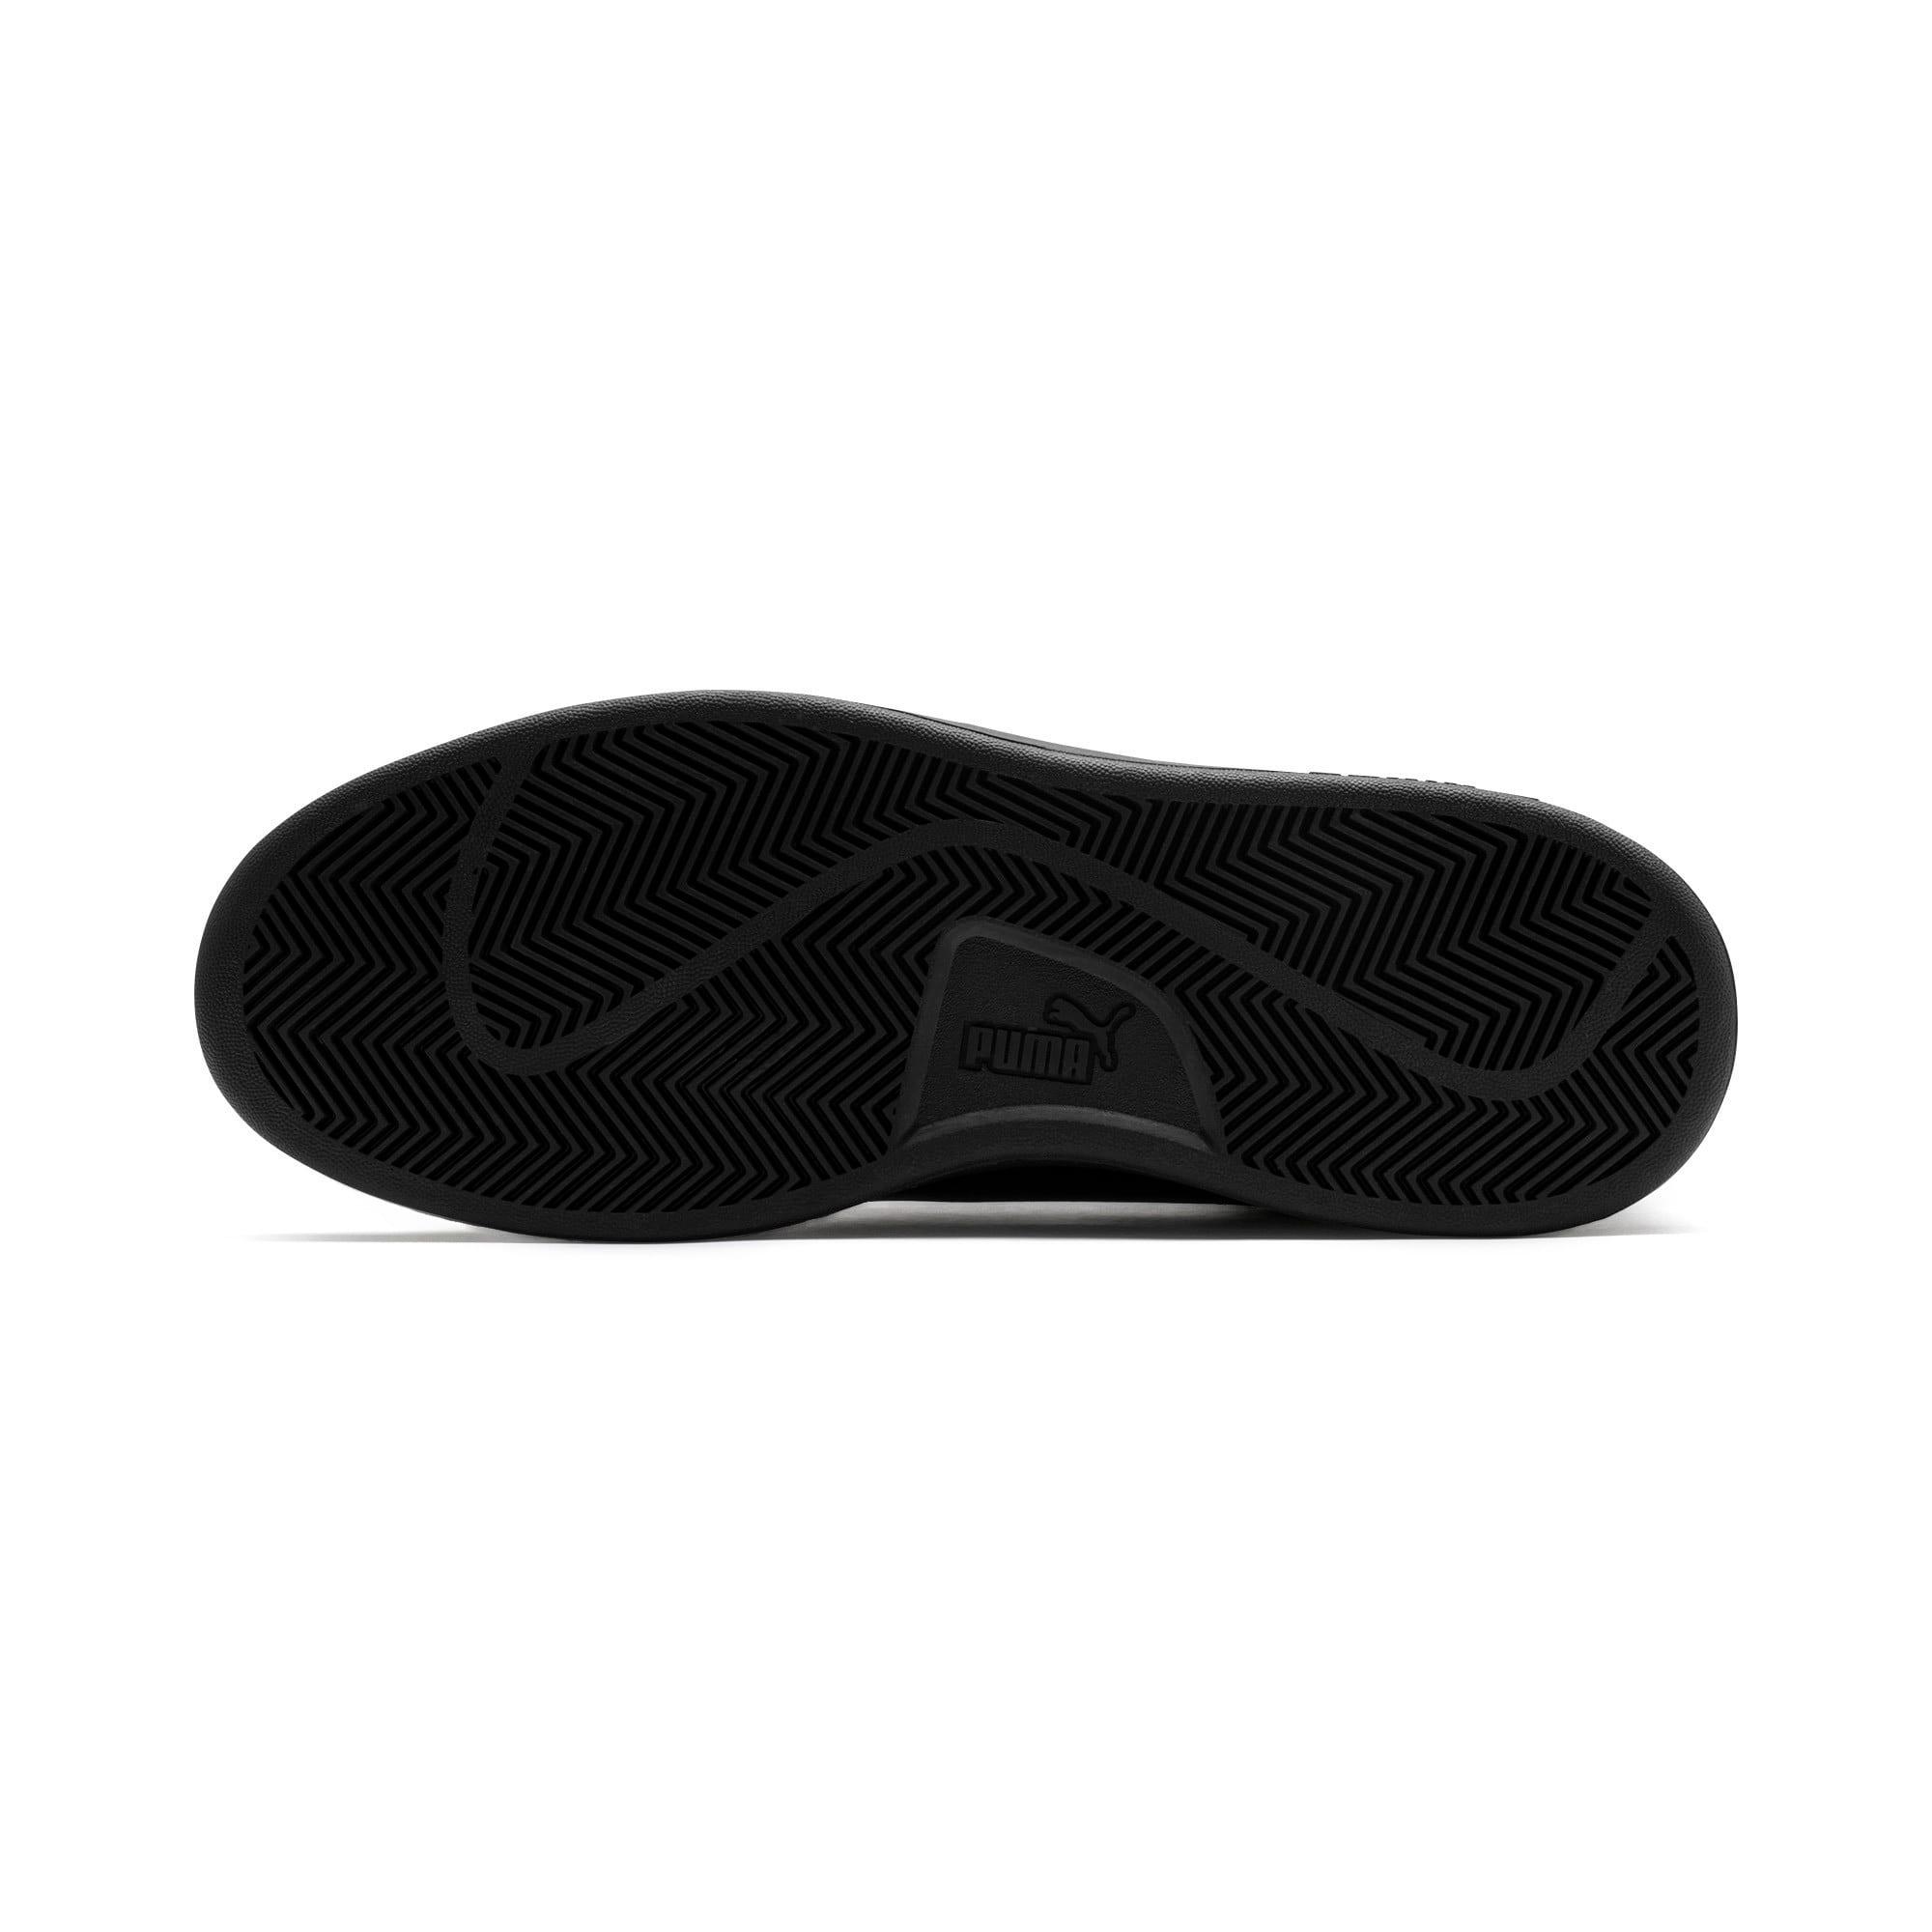 Thumbnail 5 of Mercedes AMG Petronas Smash v2 Sneakers, Black-Smkd Pearl-Spectra Grn, medium